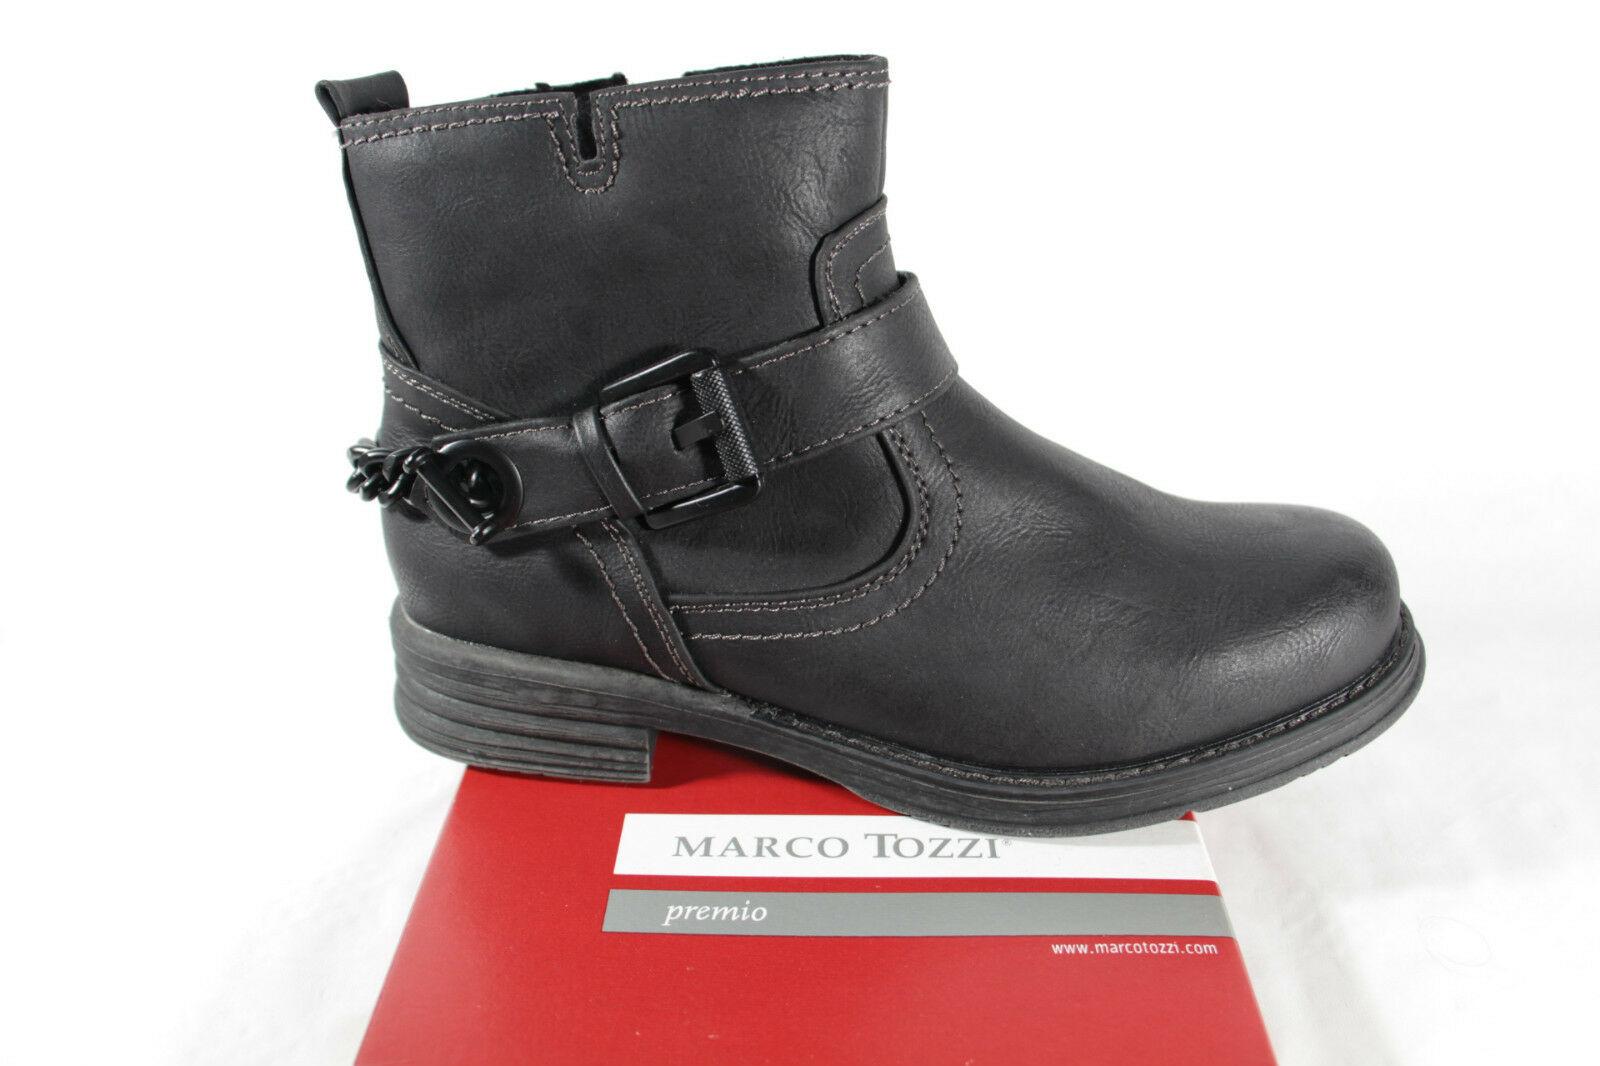 the latest e94c2 533c7 Marco Tozzi Damen Stiefel 25451 Boots Stiefelette Winterstiefel schwarz RV  NEU!!